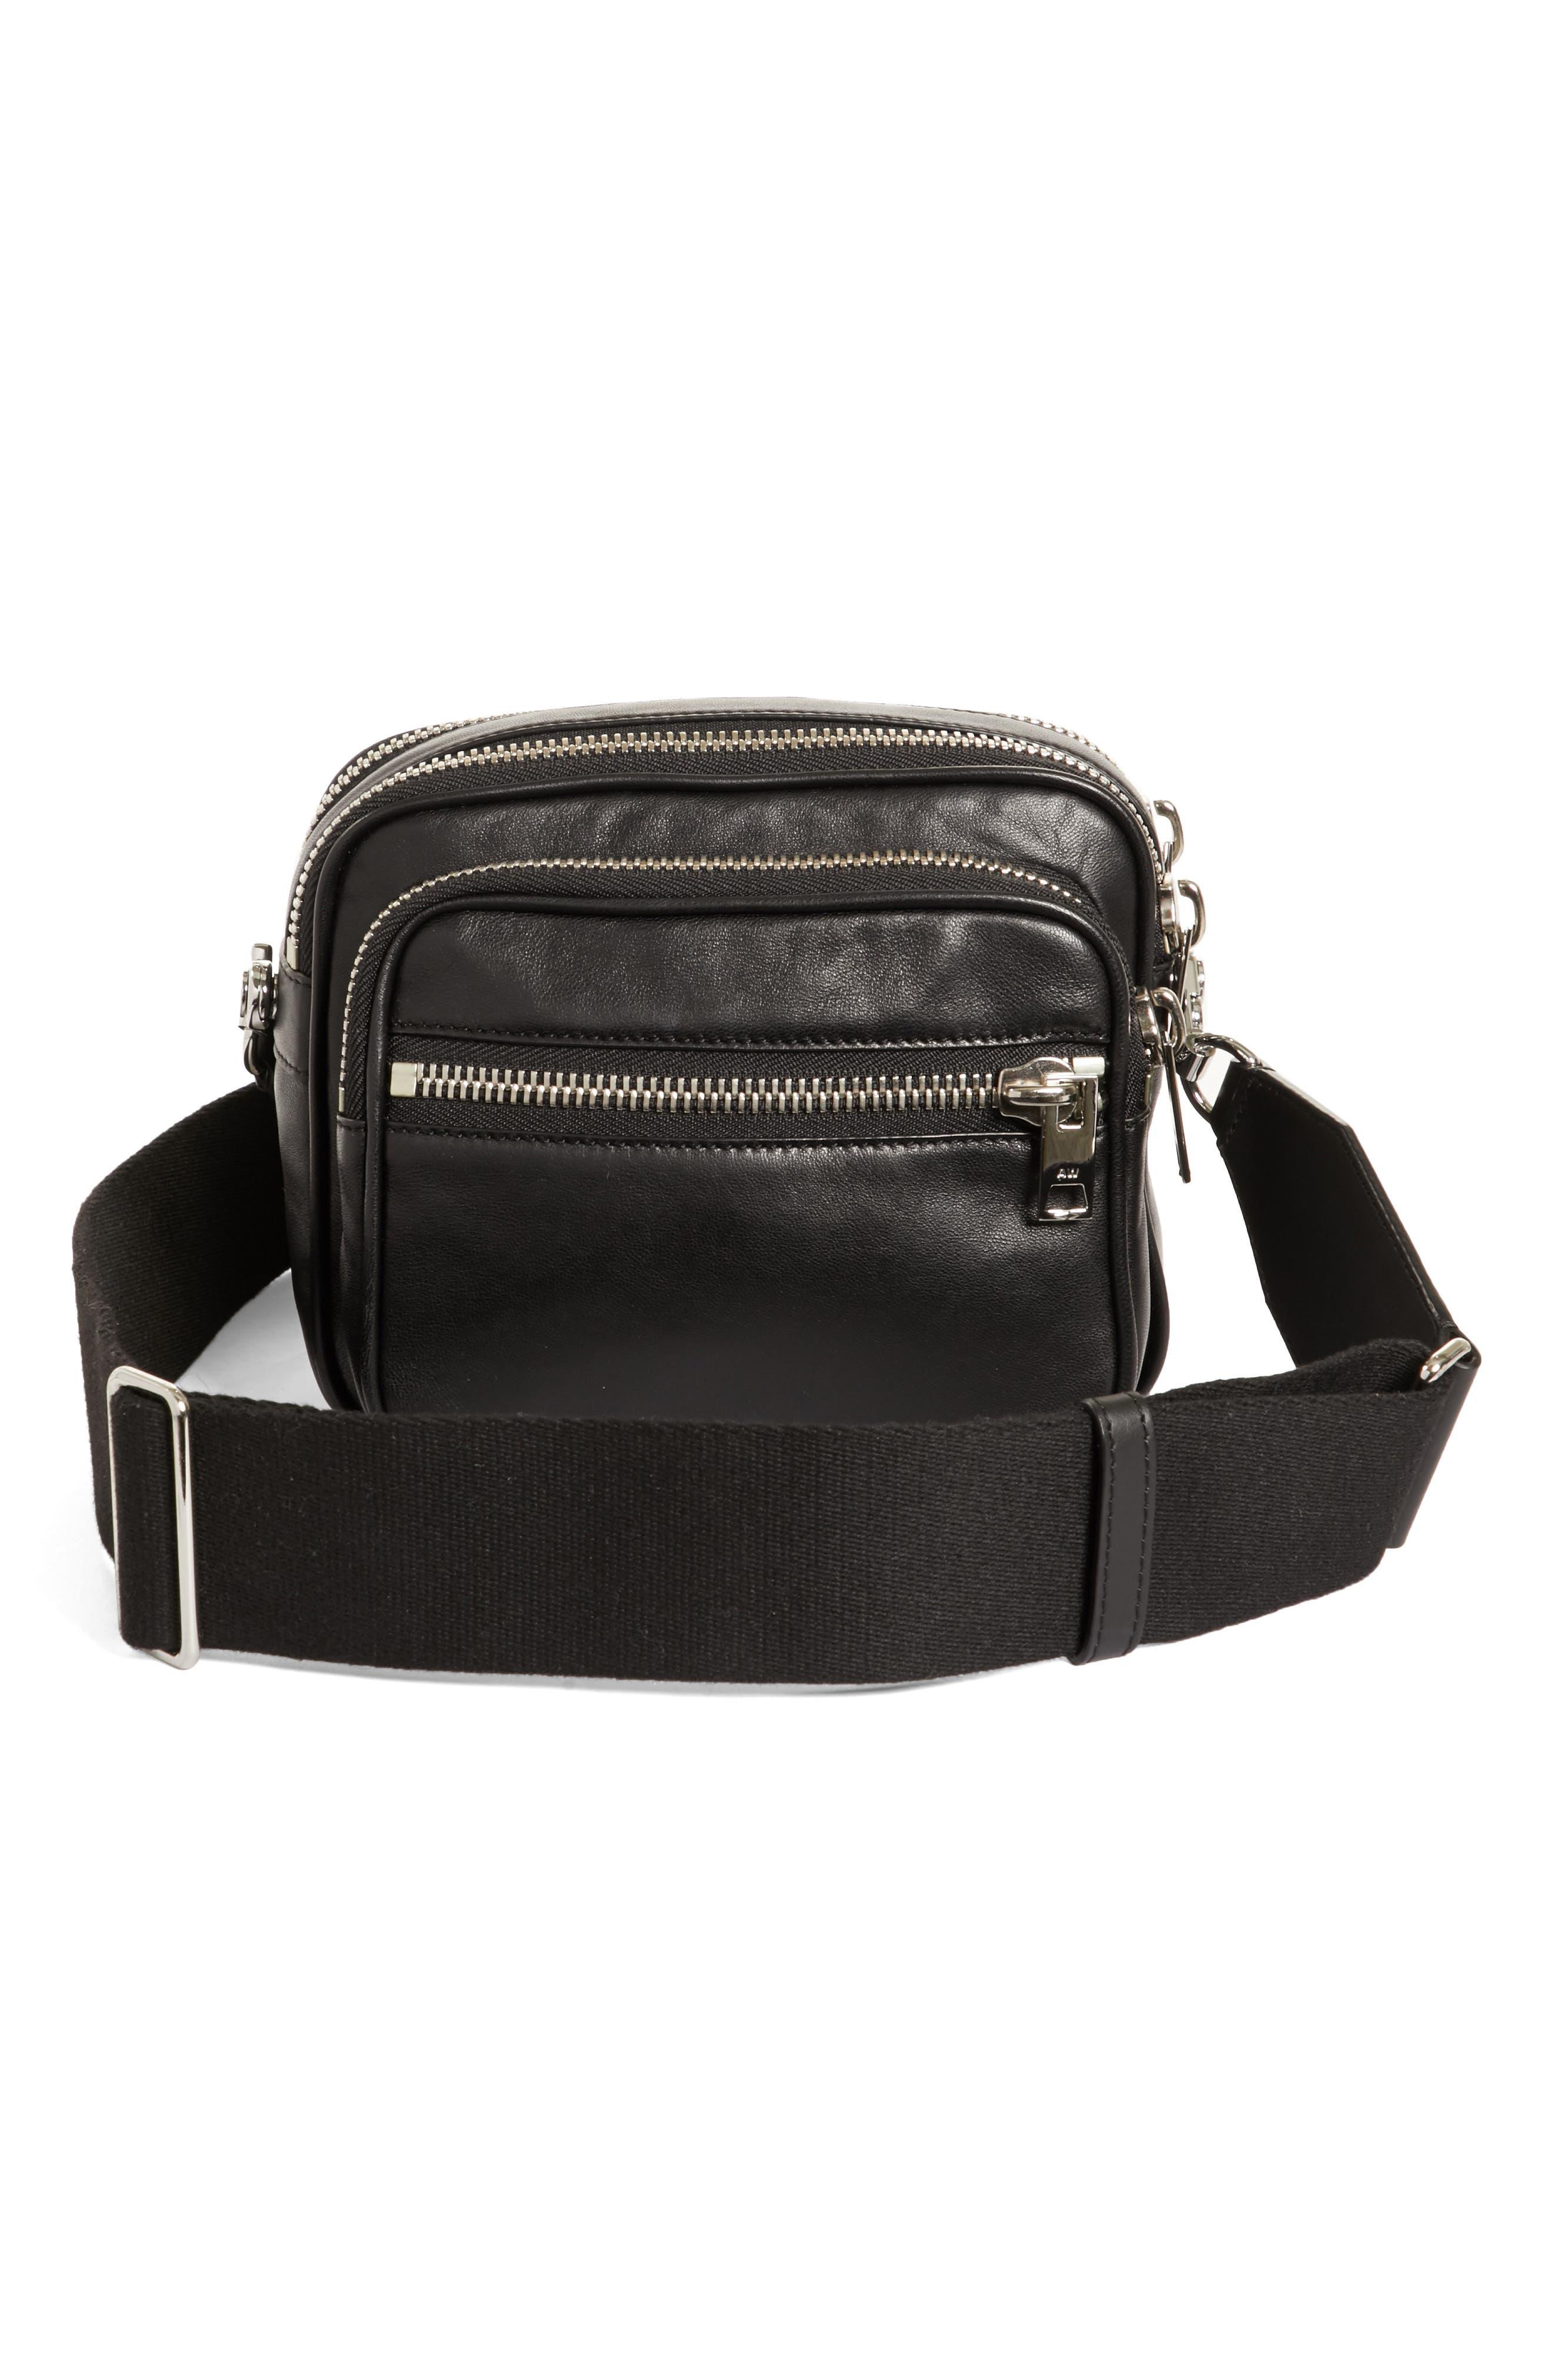 Alternate Image 3  - Alexander Wang Large Attica Leather Crossbody Bag